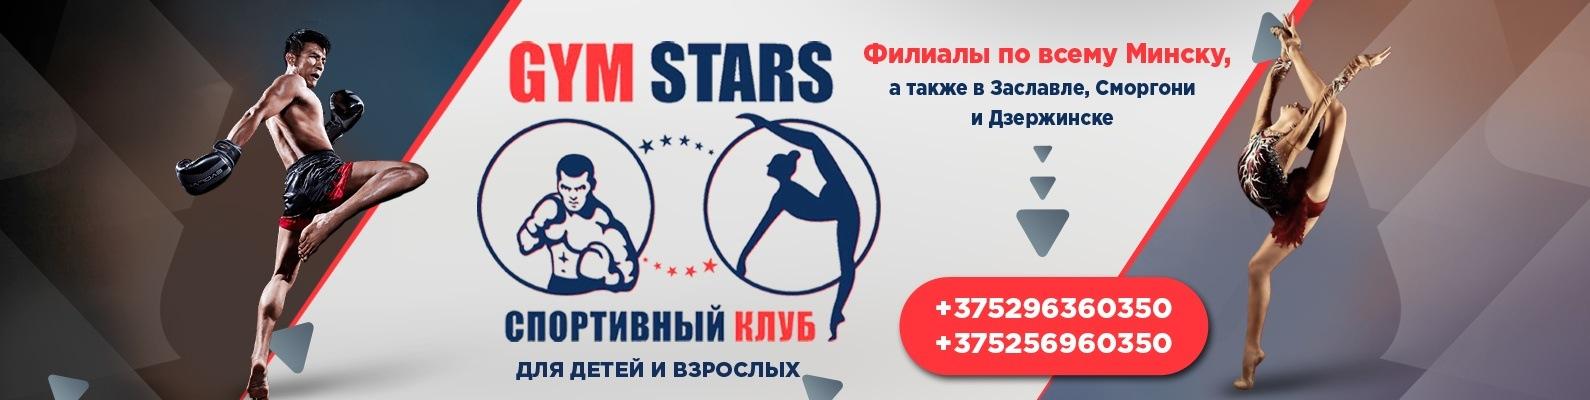 Спортивный клуб «GymStars»